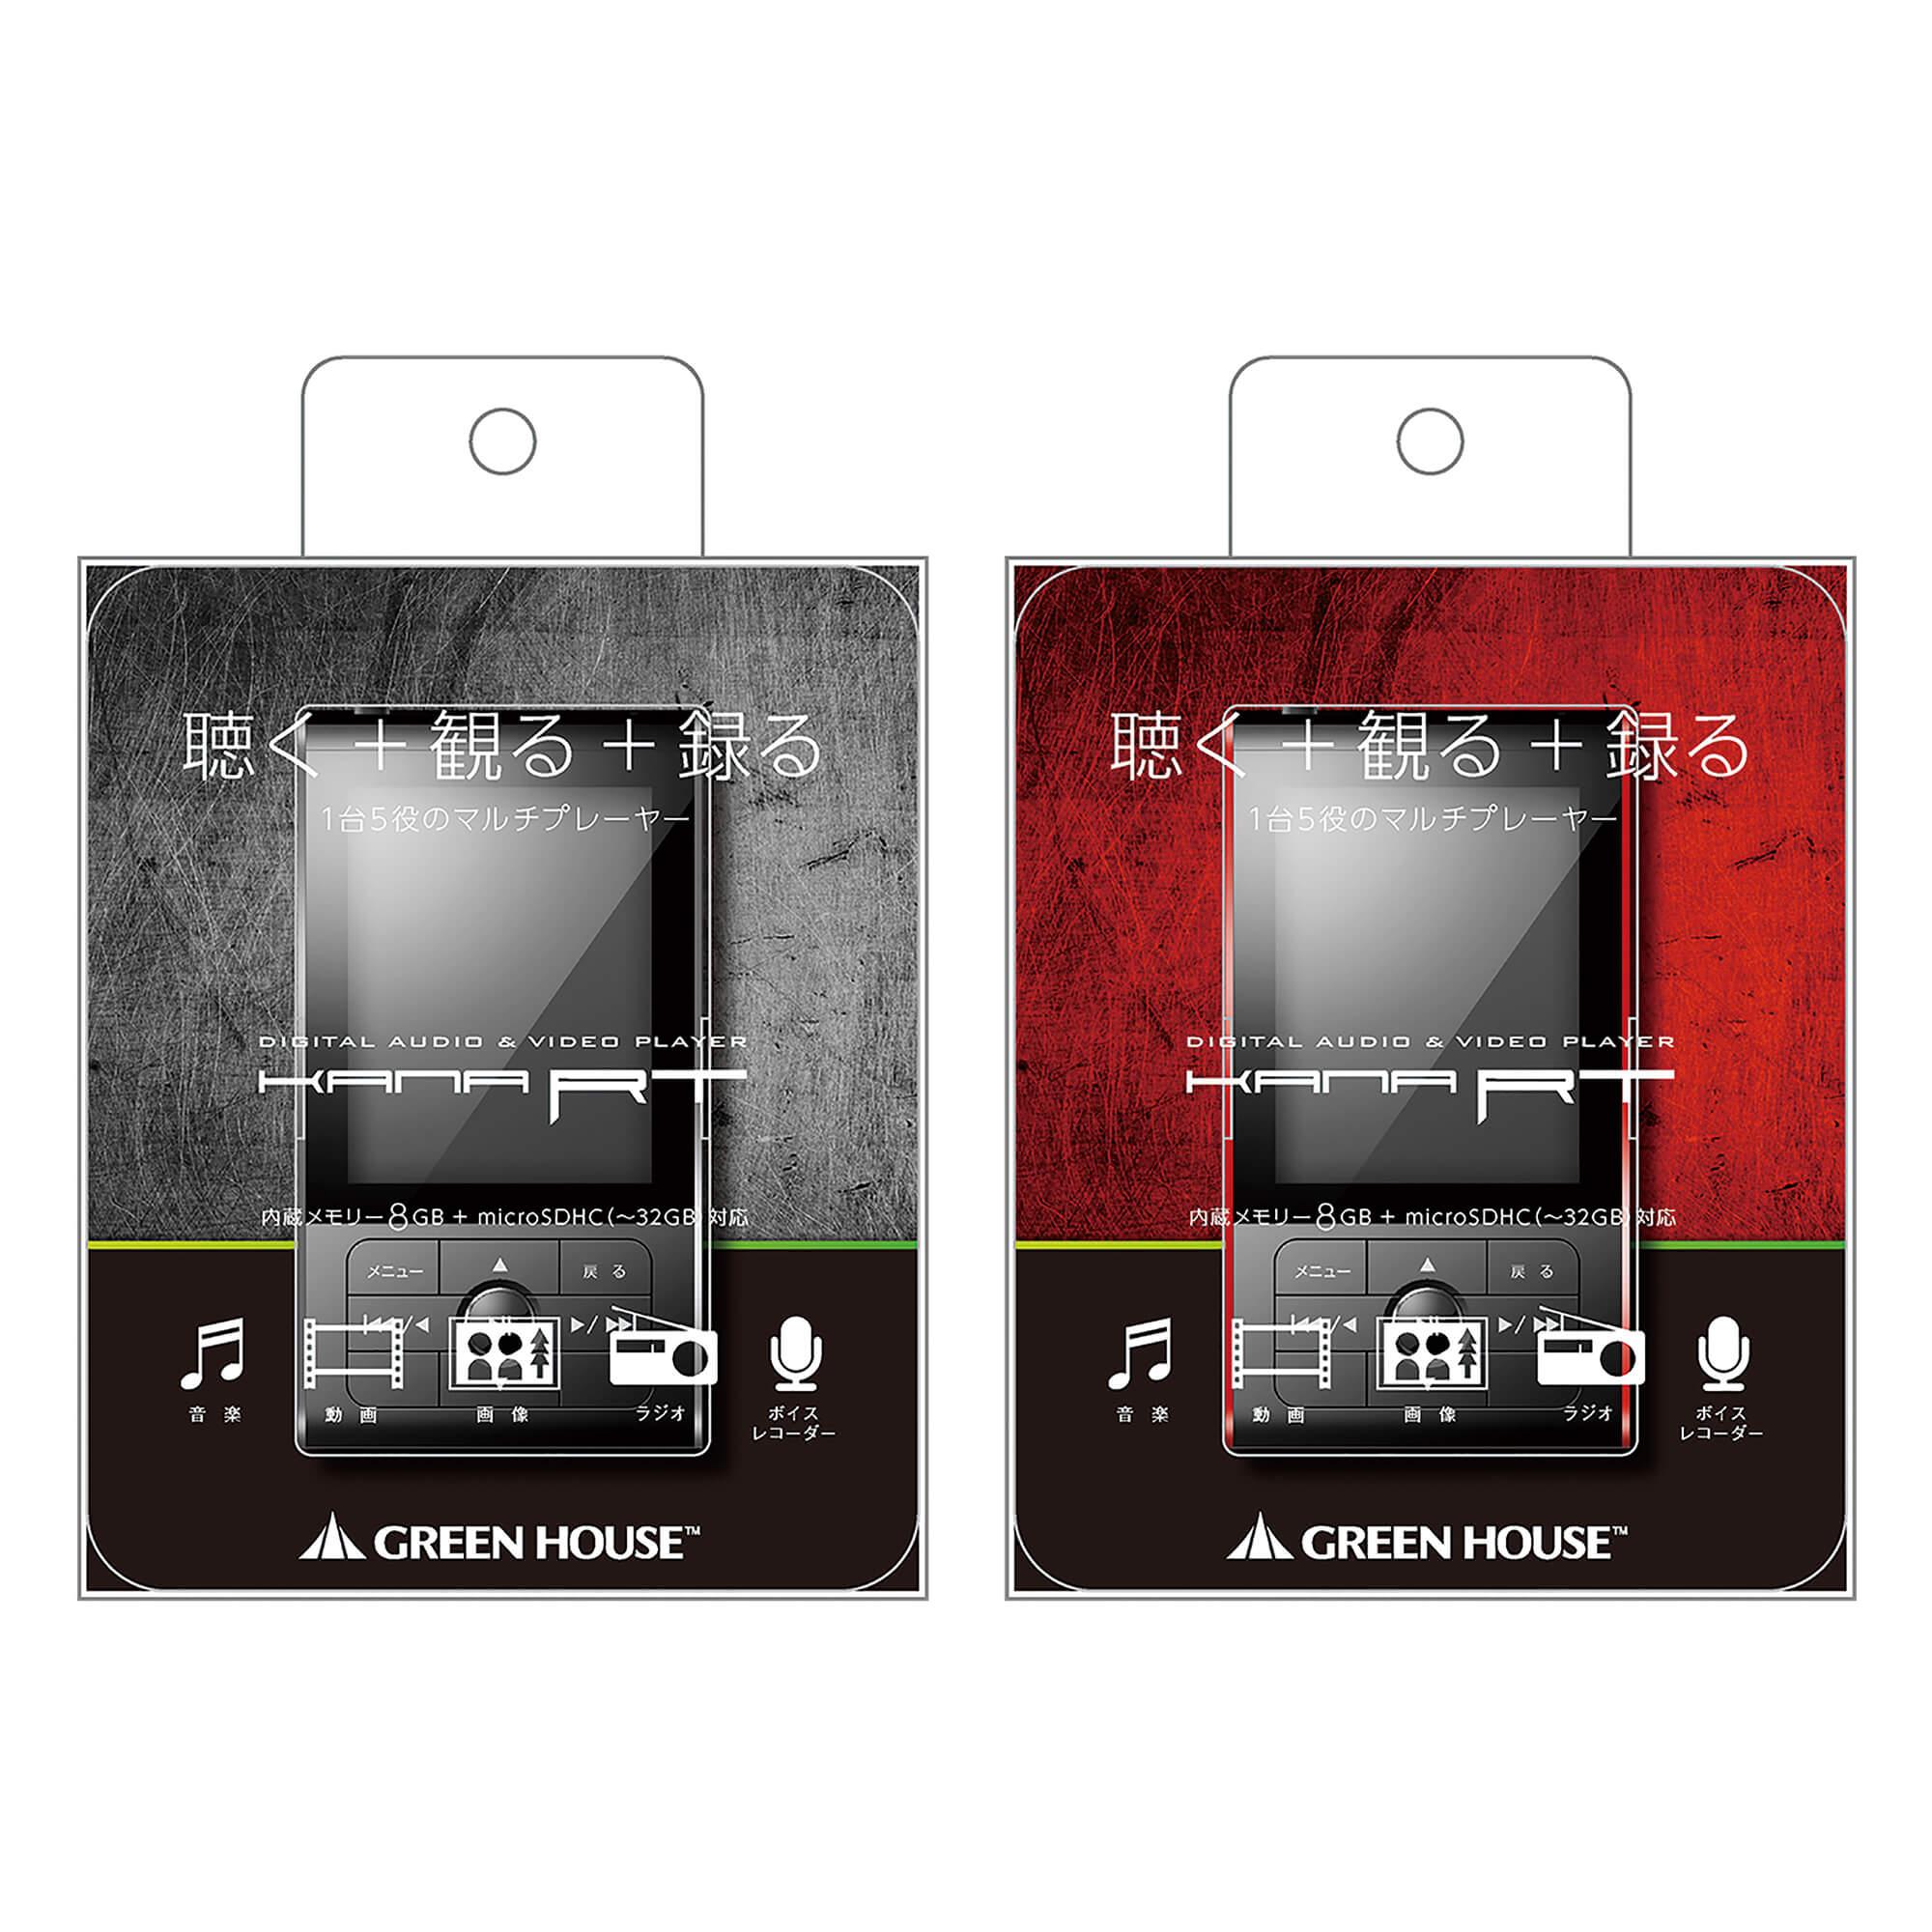 Digital Audio Player GH-KANART Series | GREENHOUSE